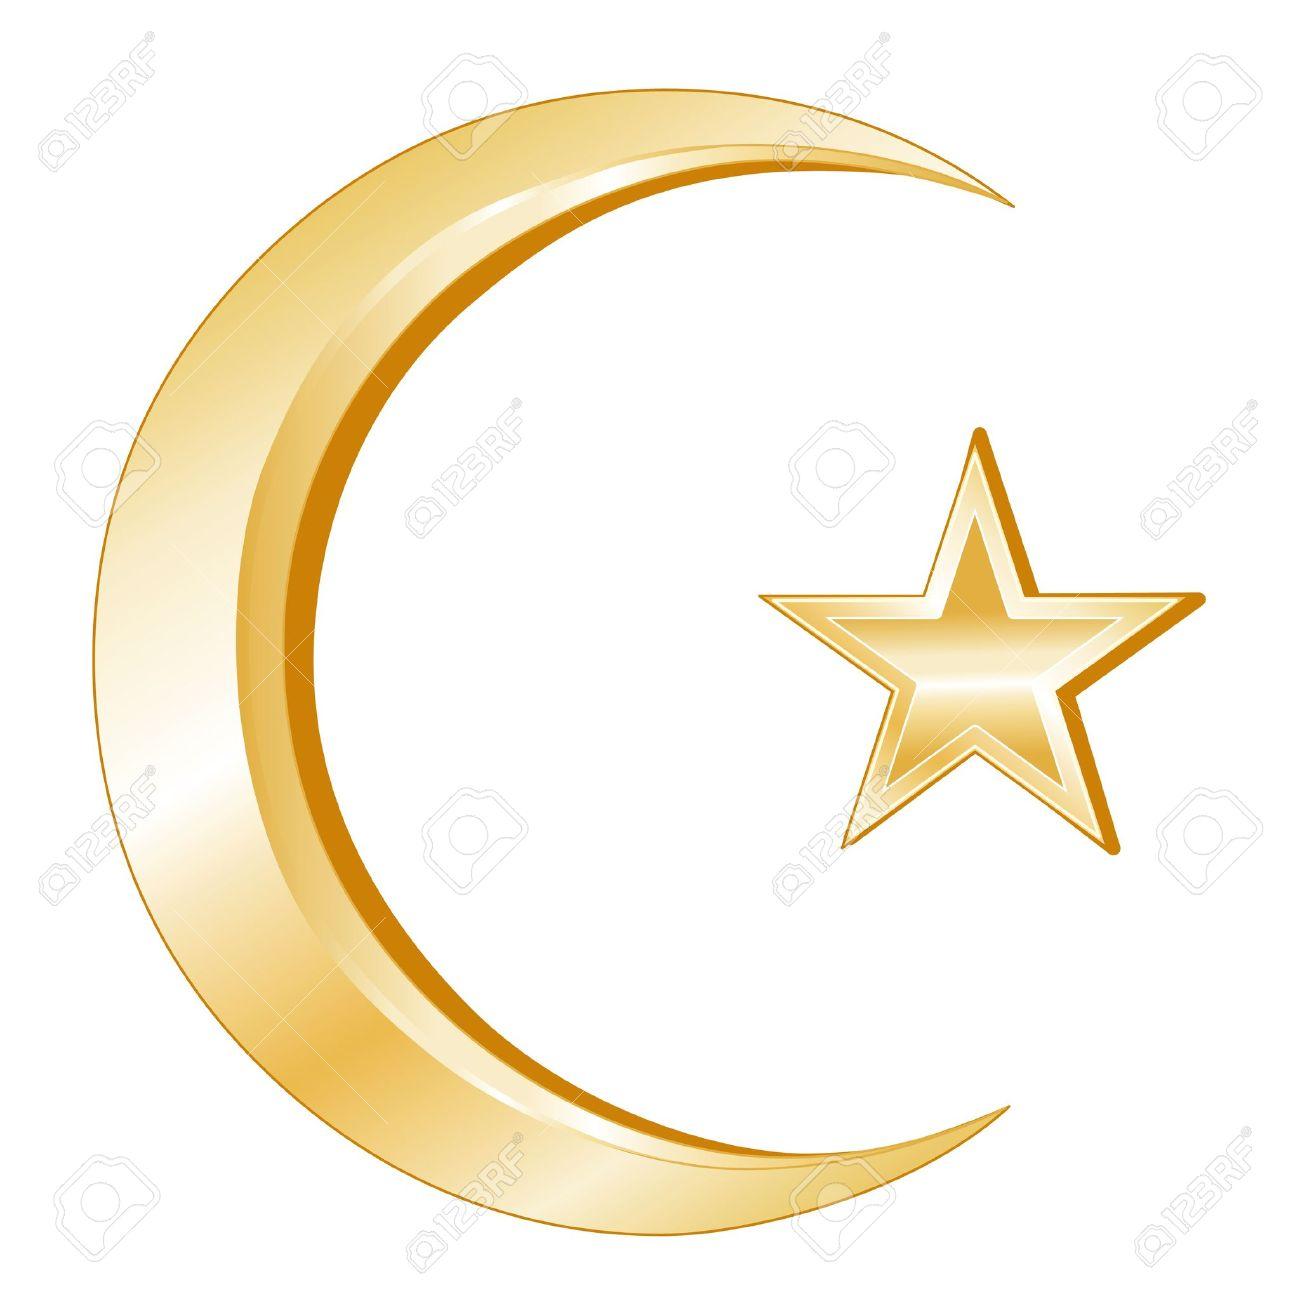 Islam Symbol Crescent And Star Golden Symbols Of Islamic Faith